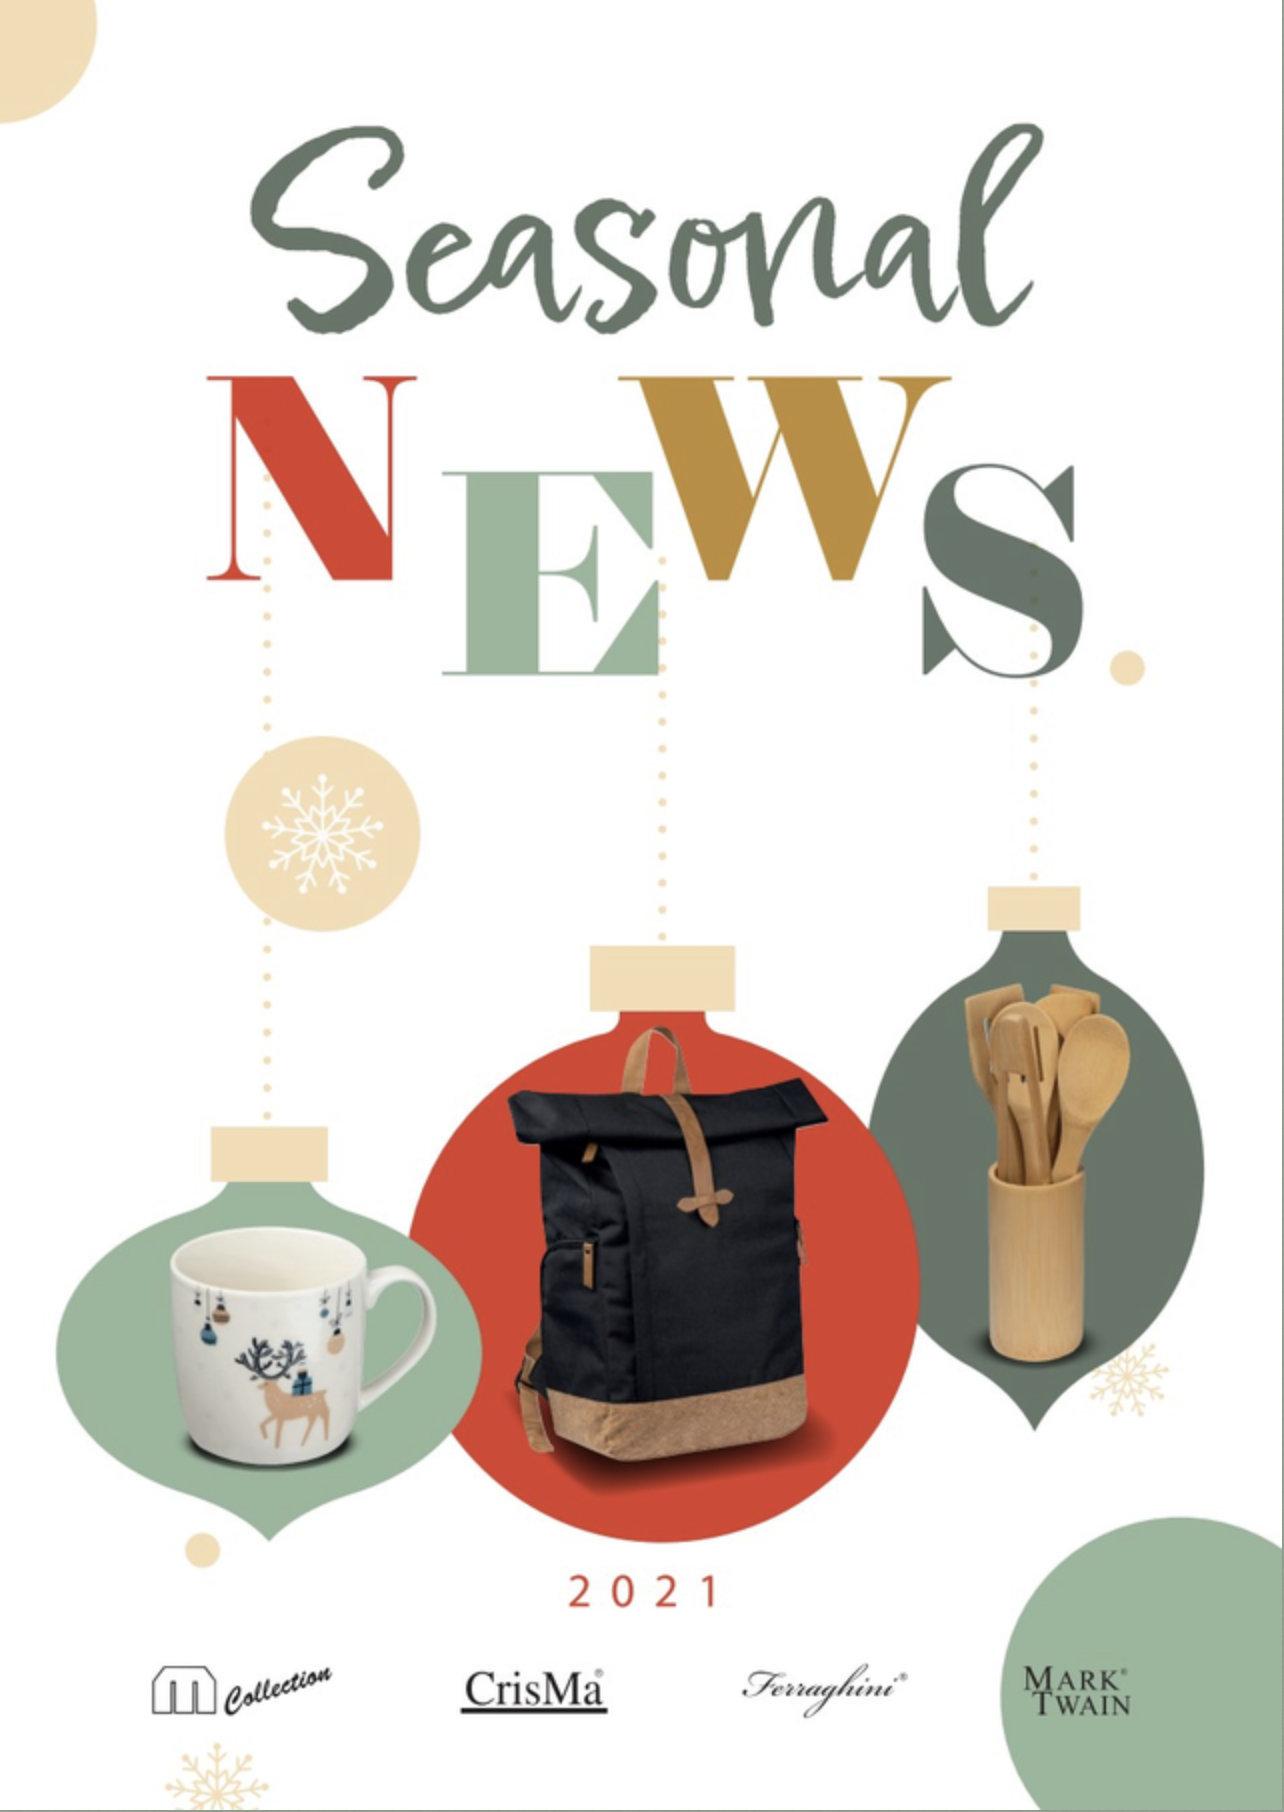 Seasonal NEWS